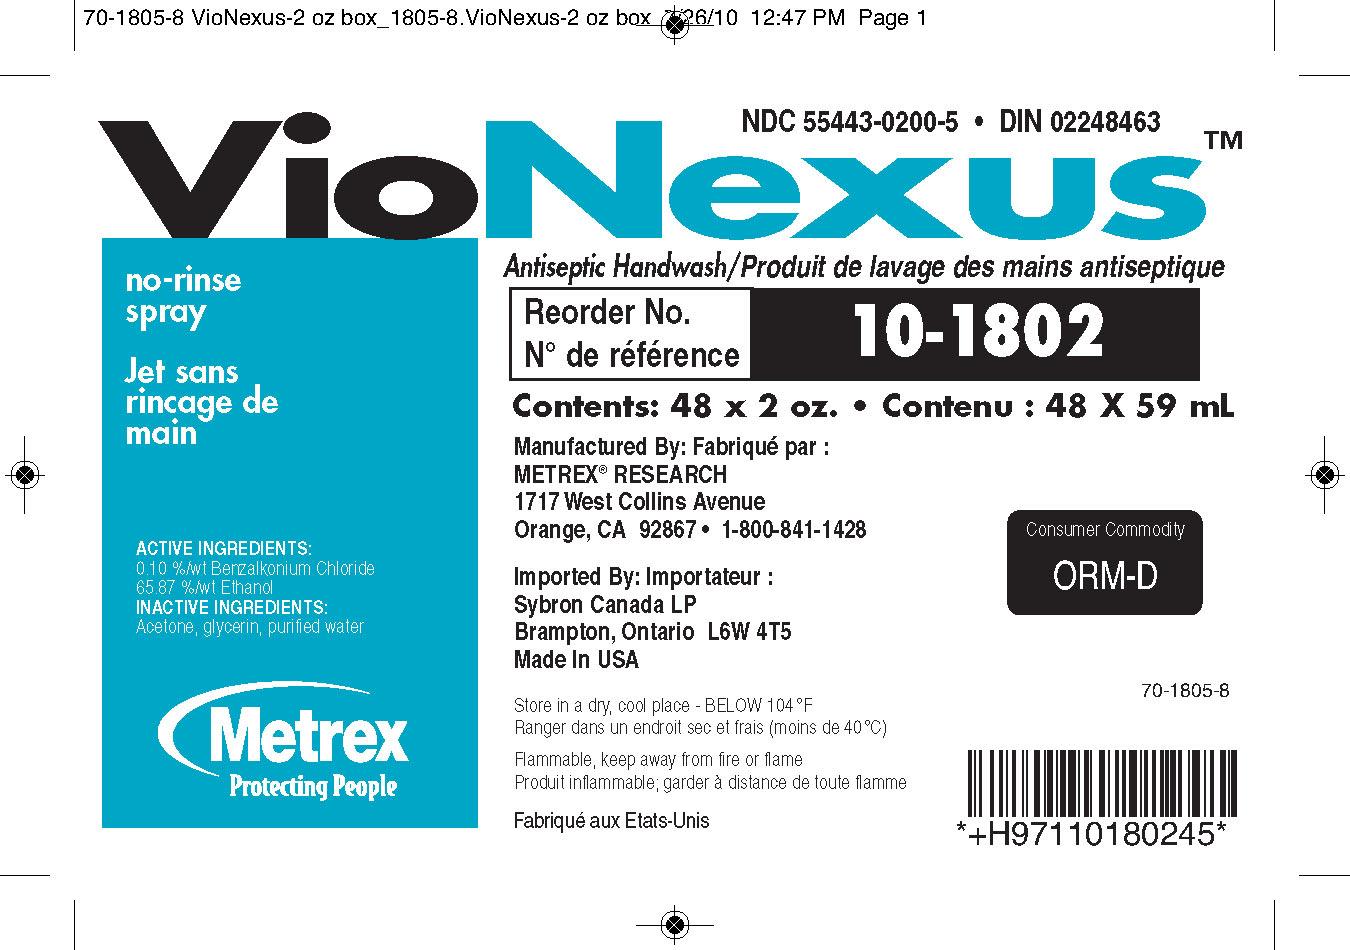 image of VioNexusNRSBox